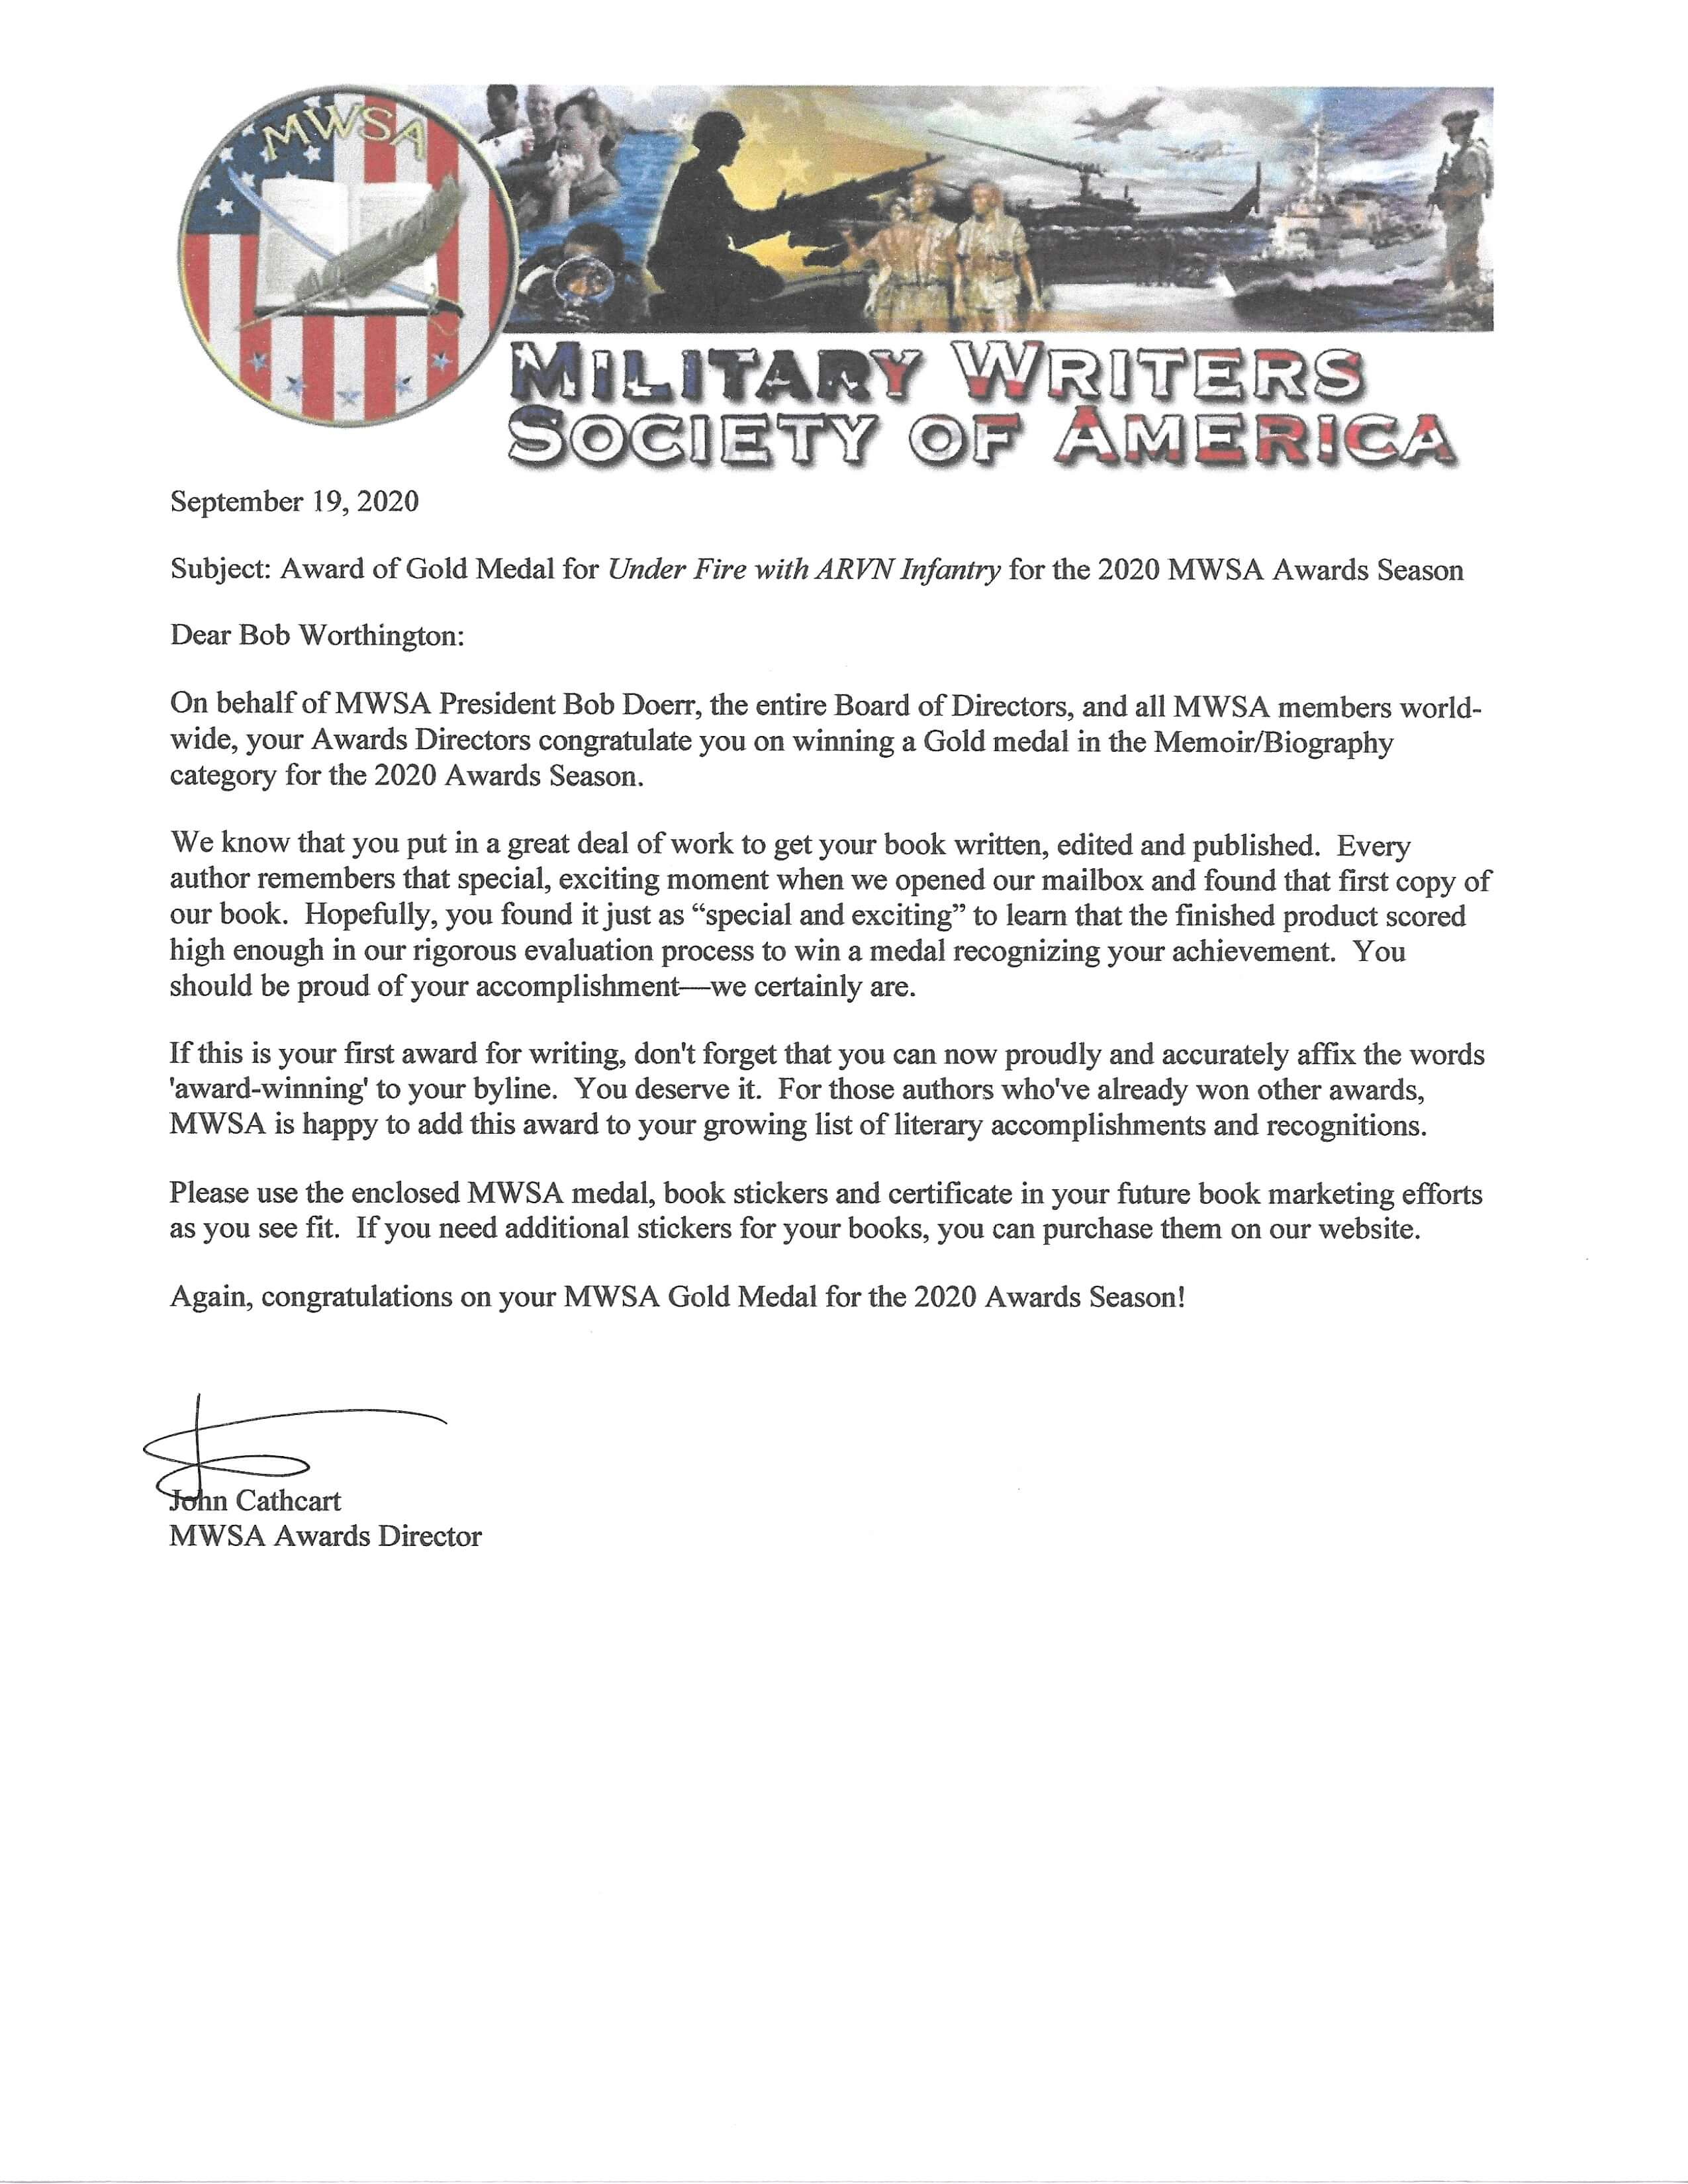 MSWA award letter 2020